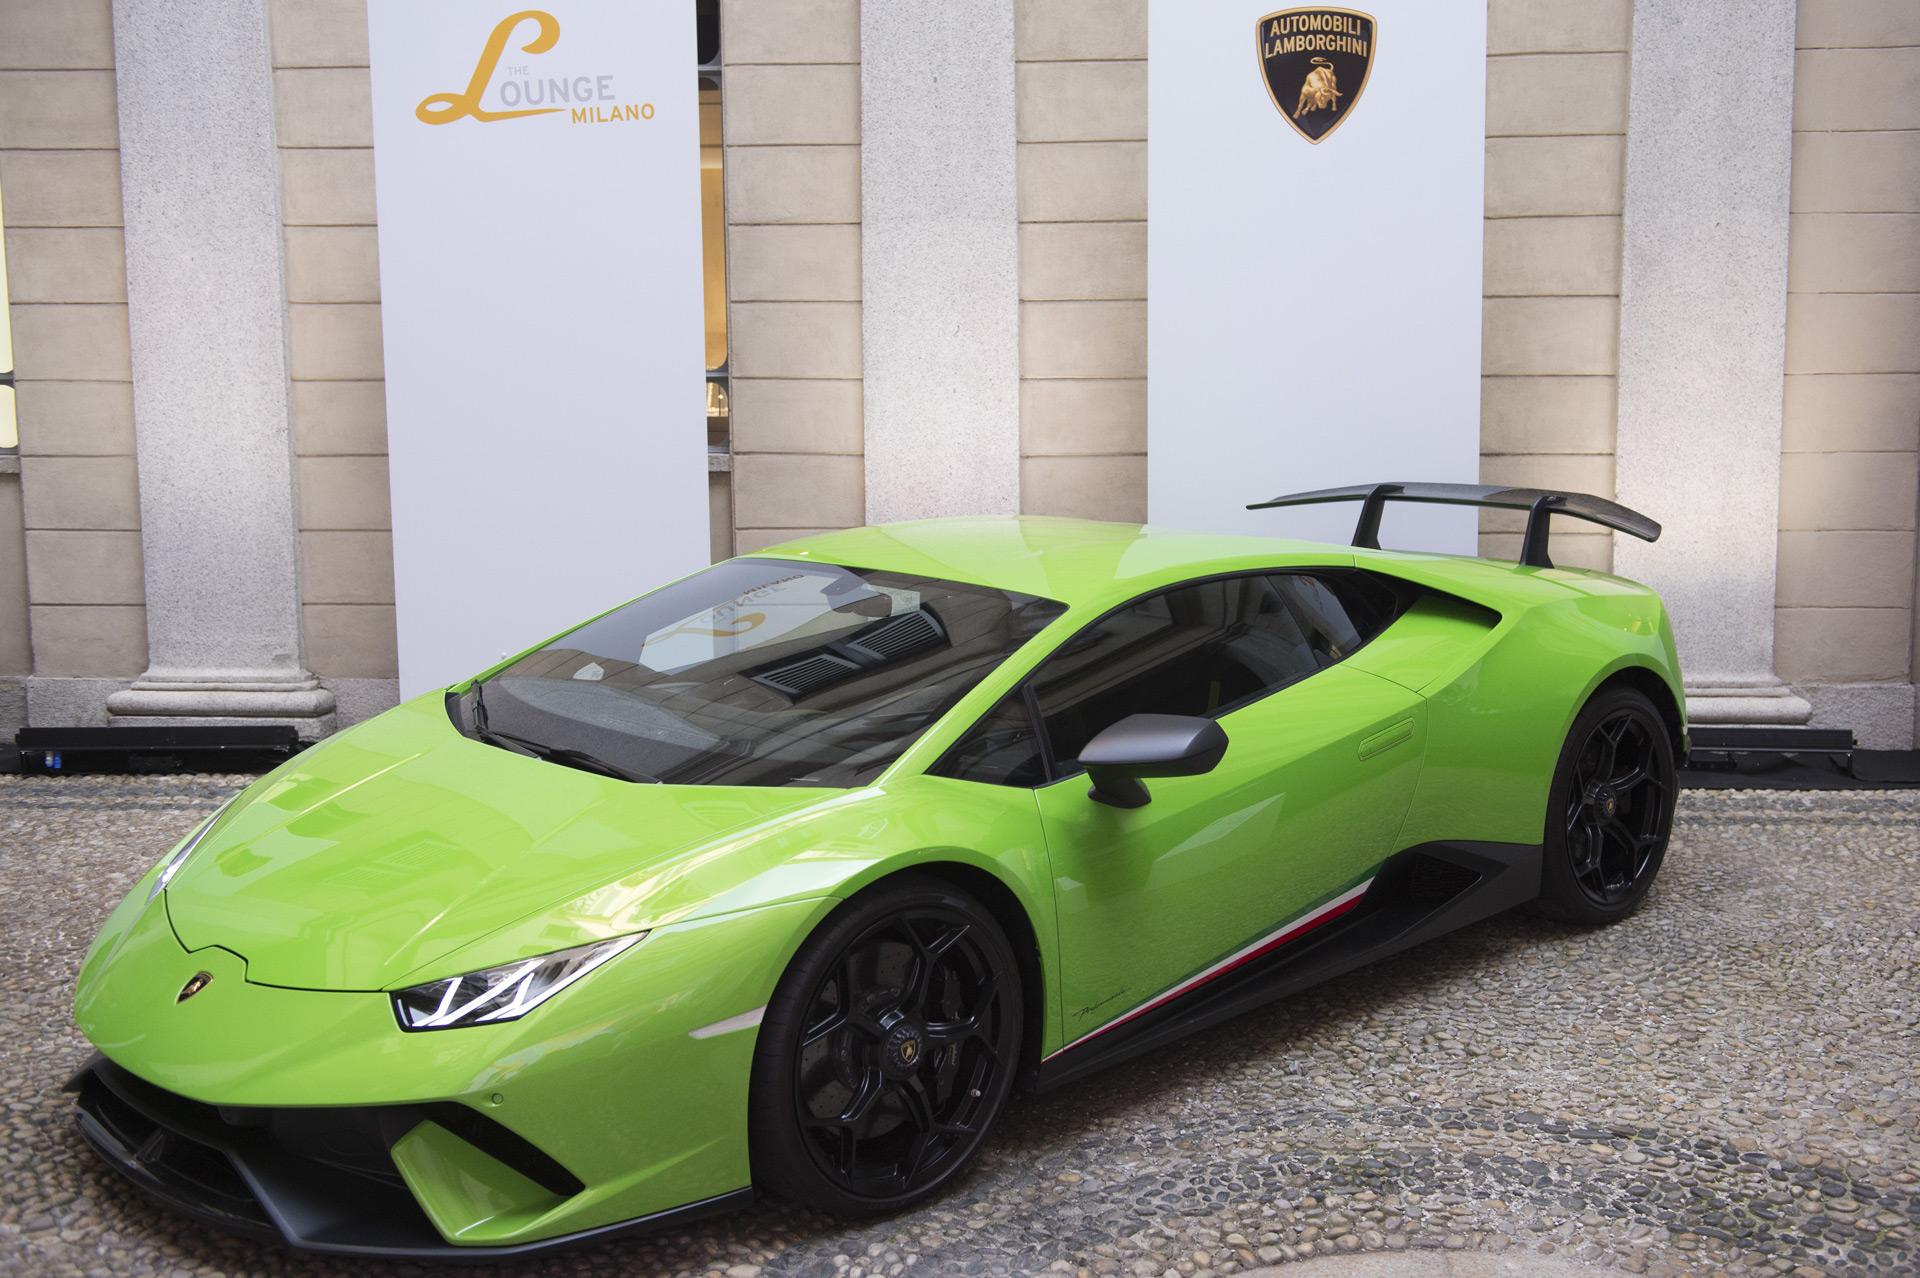 Collezione Automobili Lamborghini представляет коллекцию Весна-лето 2019